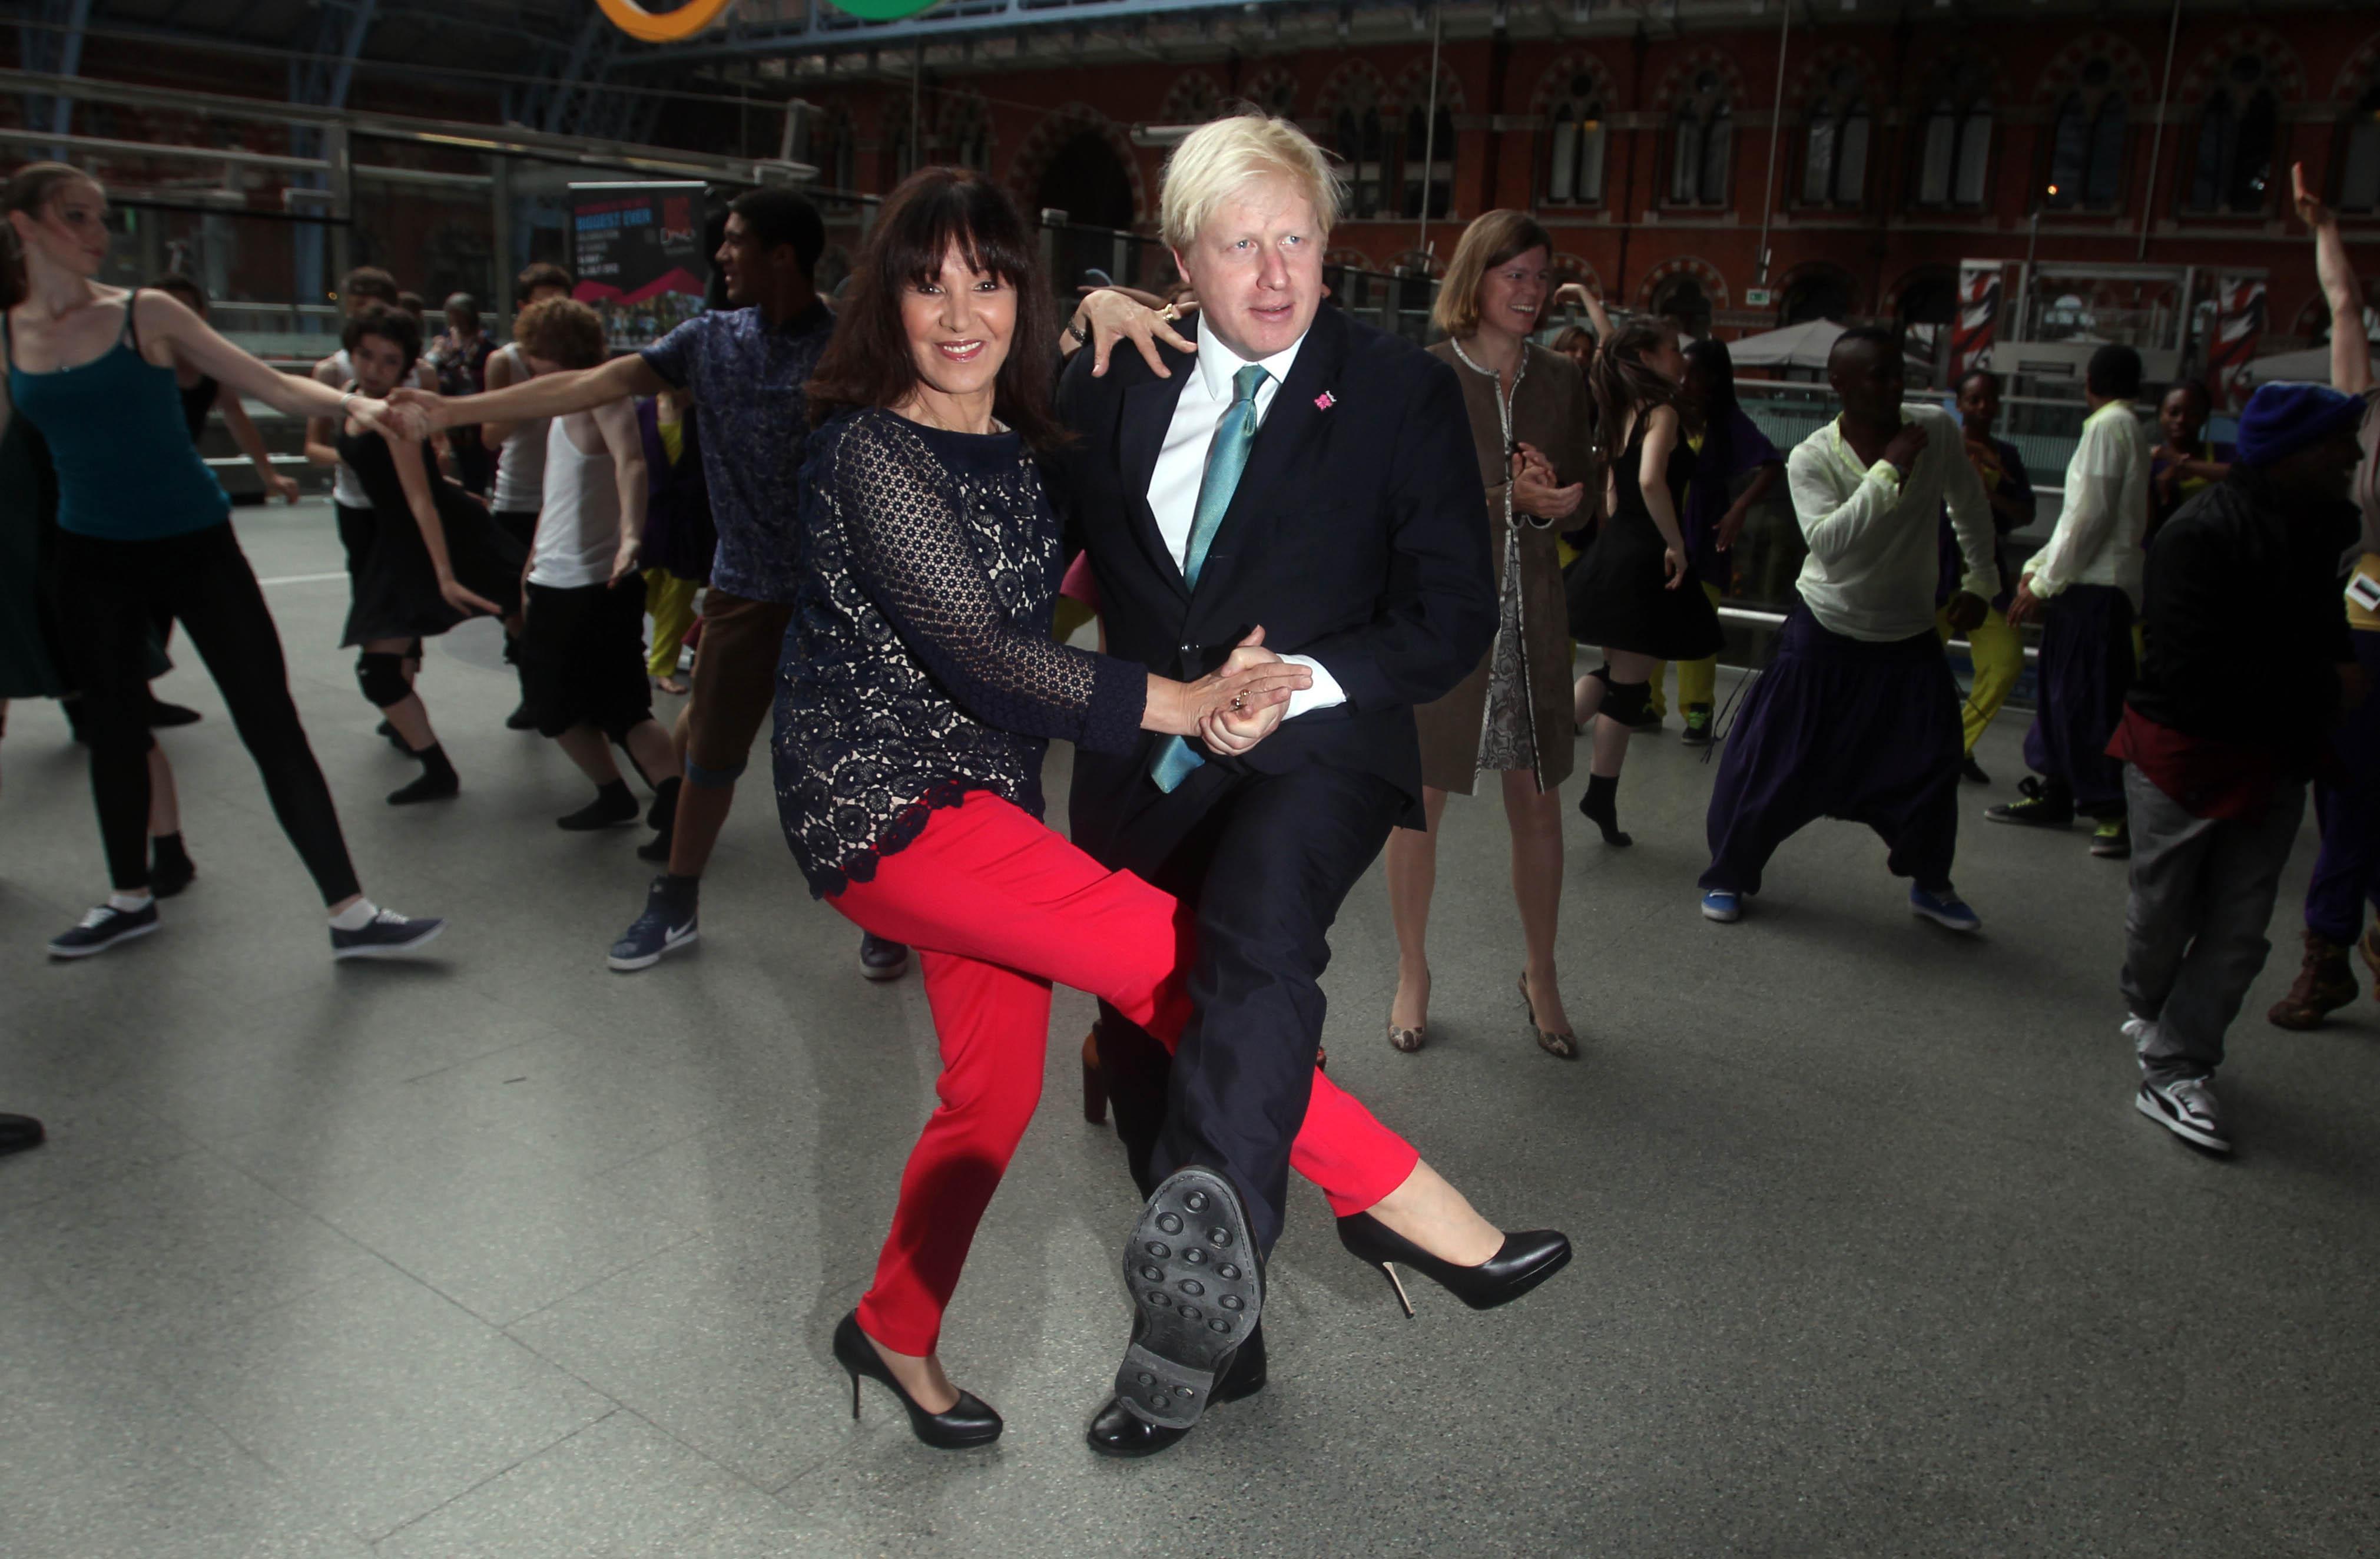 Mayor of London Boris Johnson and Arlene Phillips dance at St Pancras International Station during the launch of Big Dance 2012.